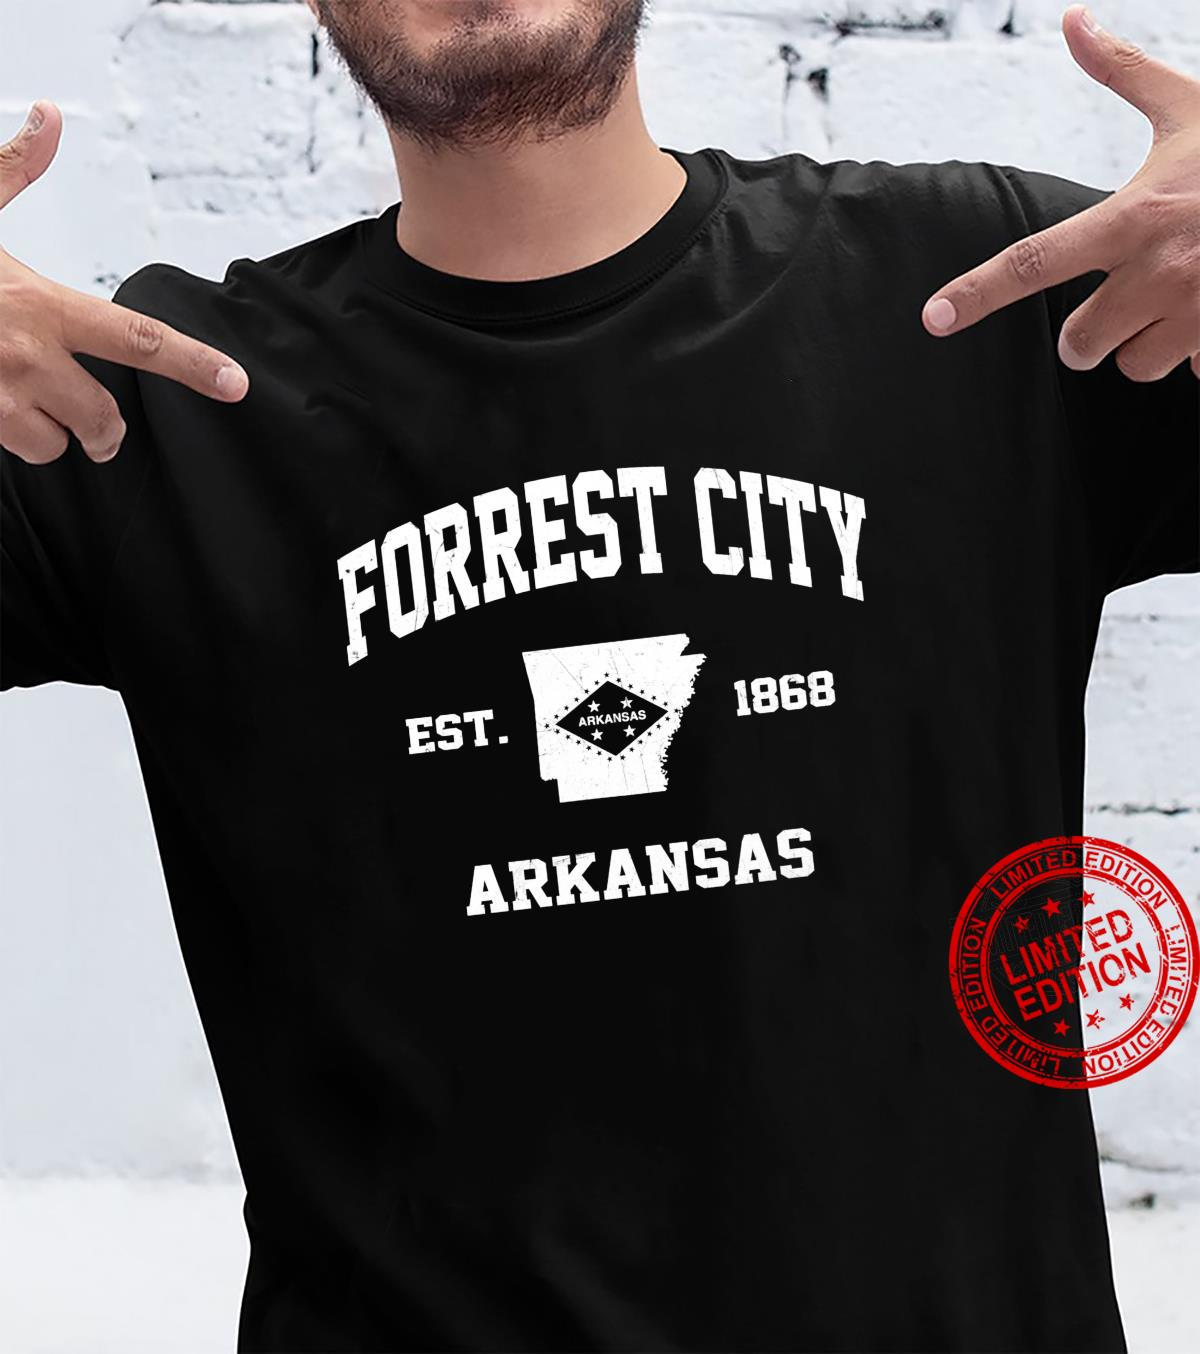 Forrest City Arkansas AR vintage State Athletic style Shirt